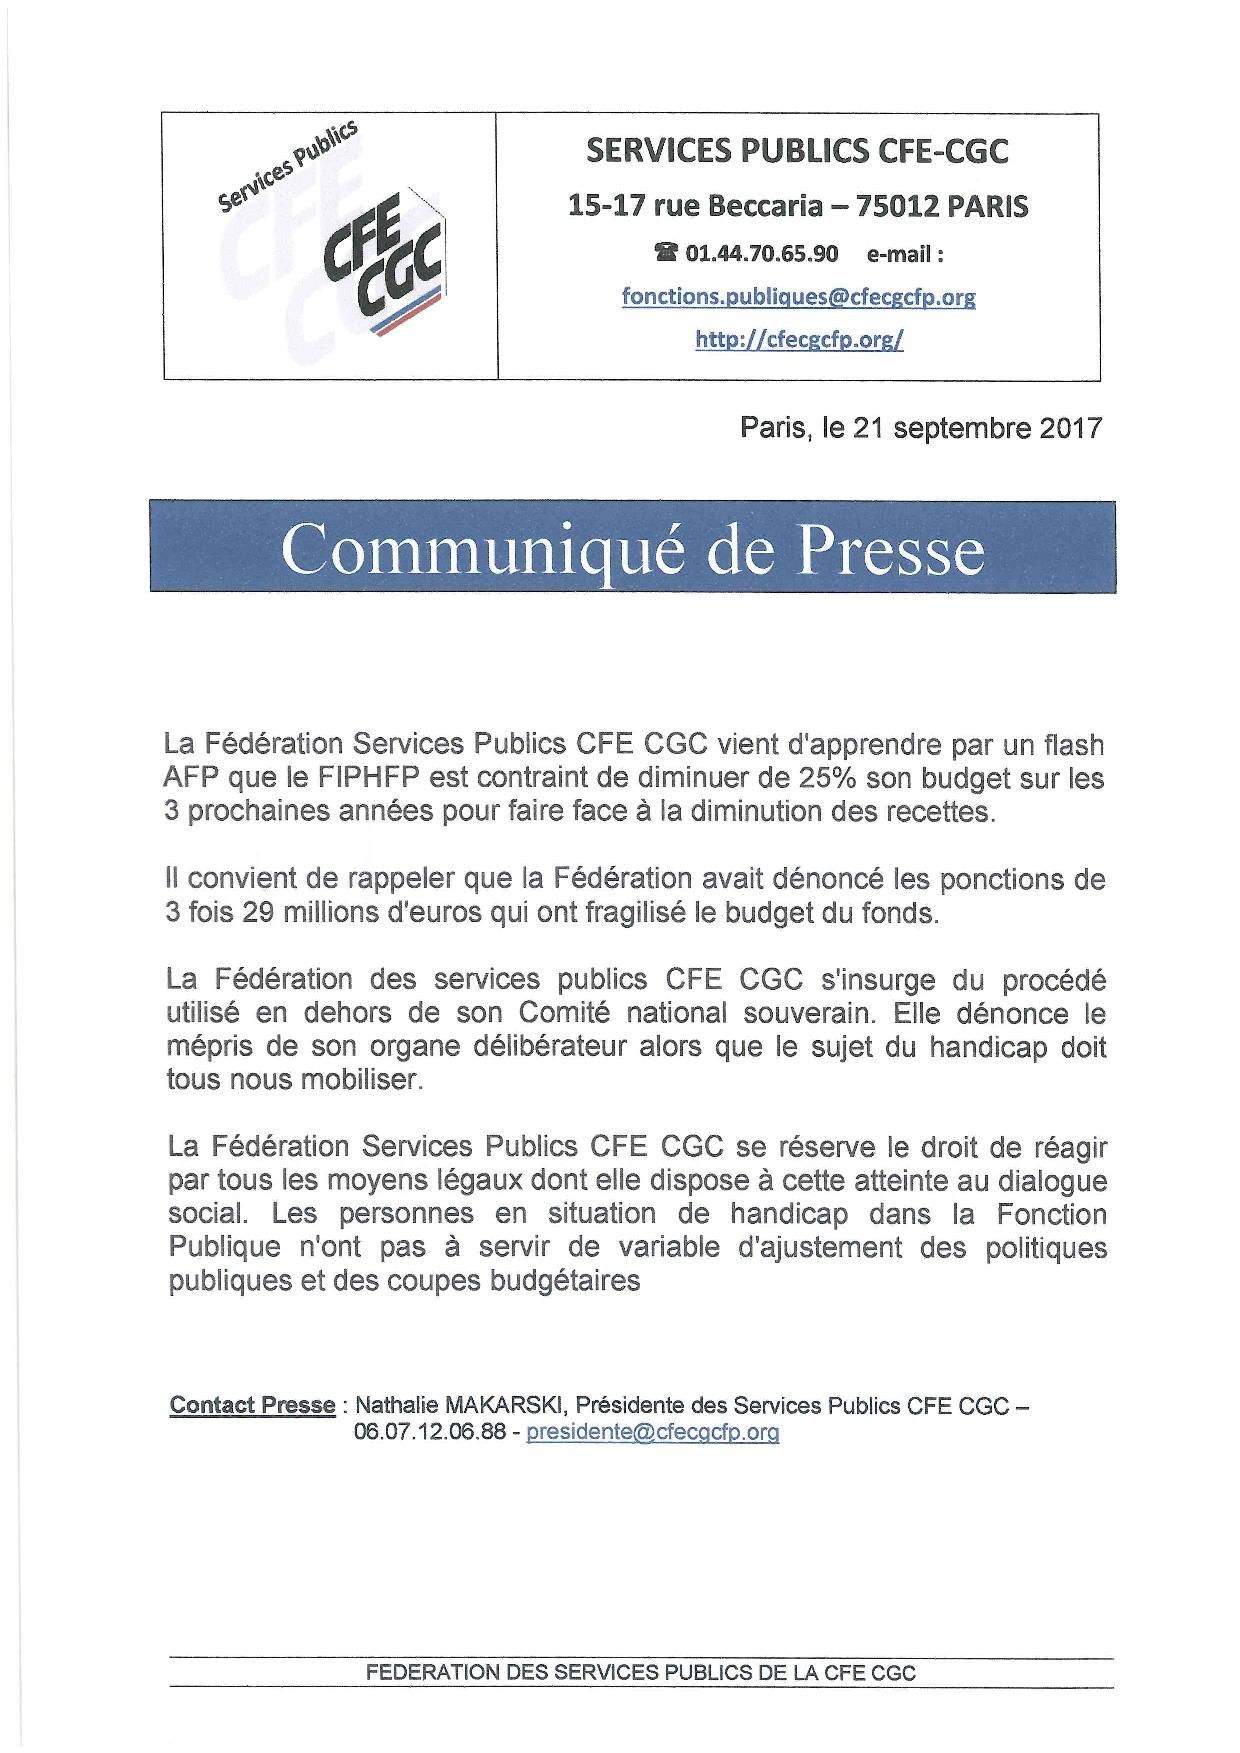 COM PRESSE SP CFE CGC 21-09-17 - FIPHFP-page-001